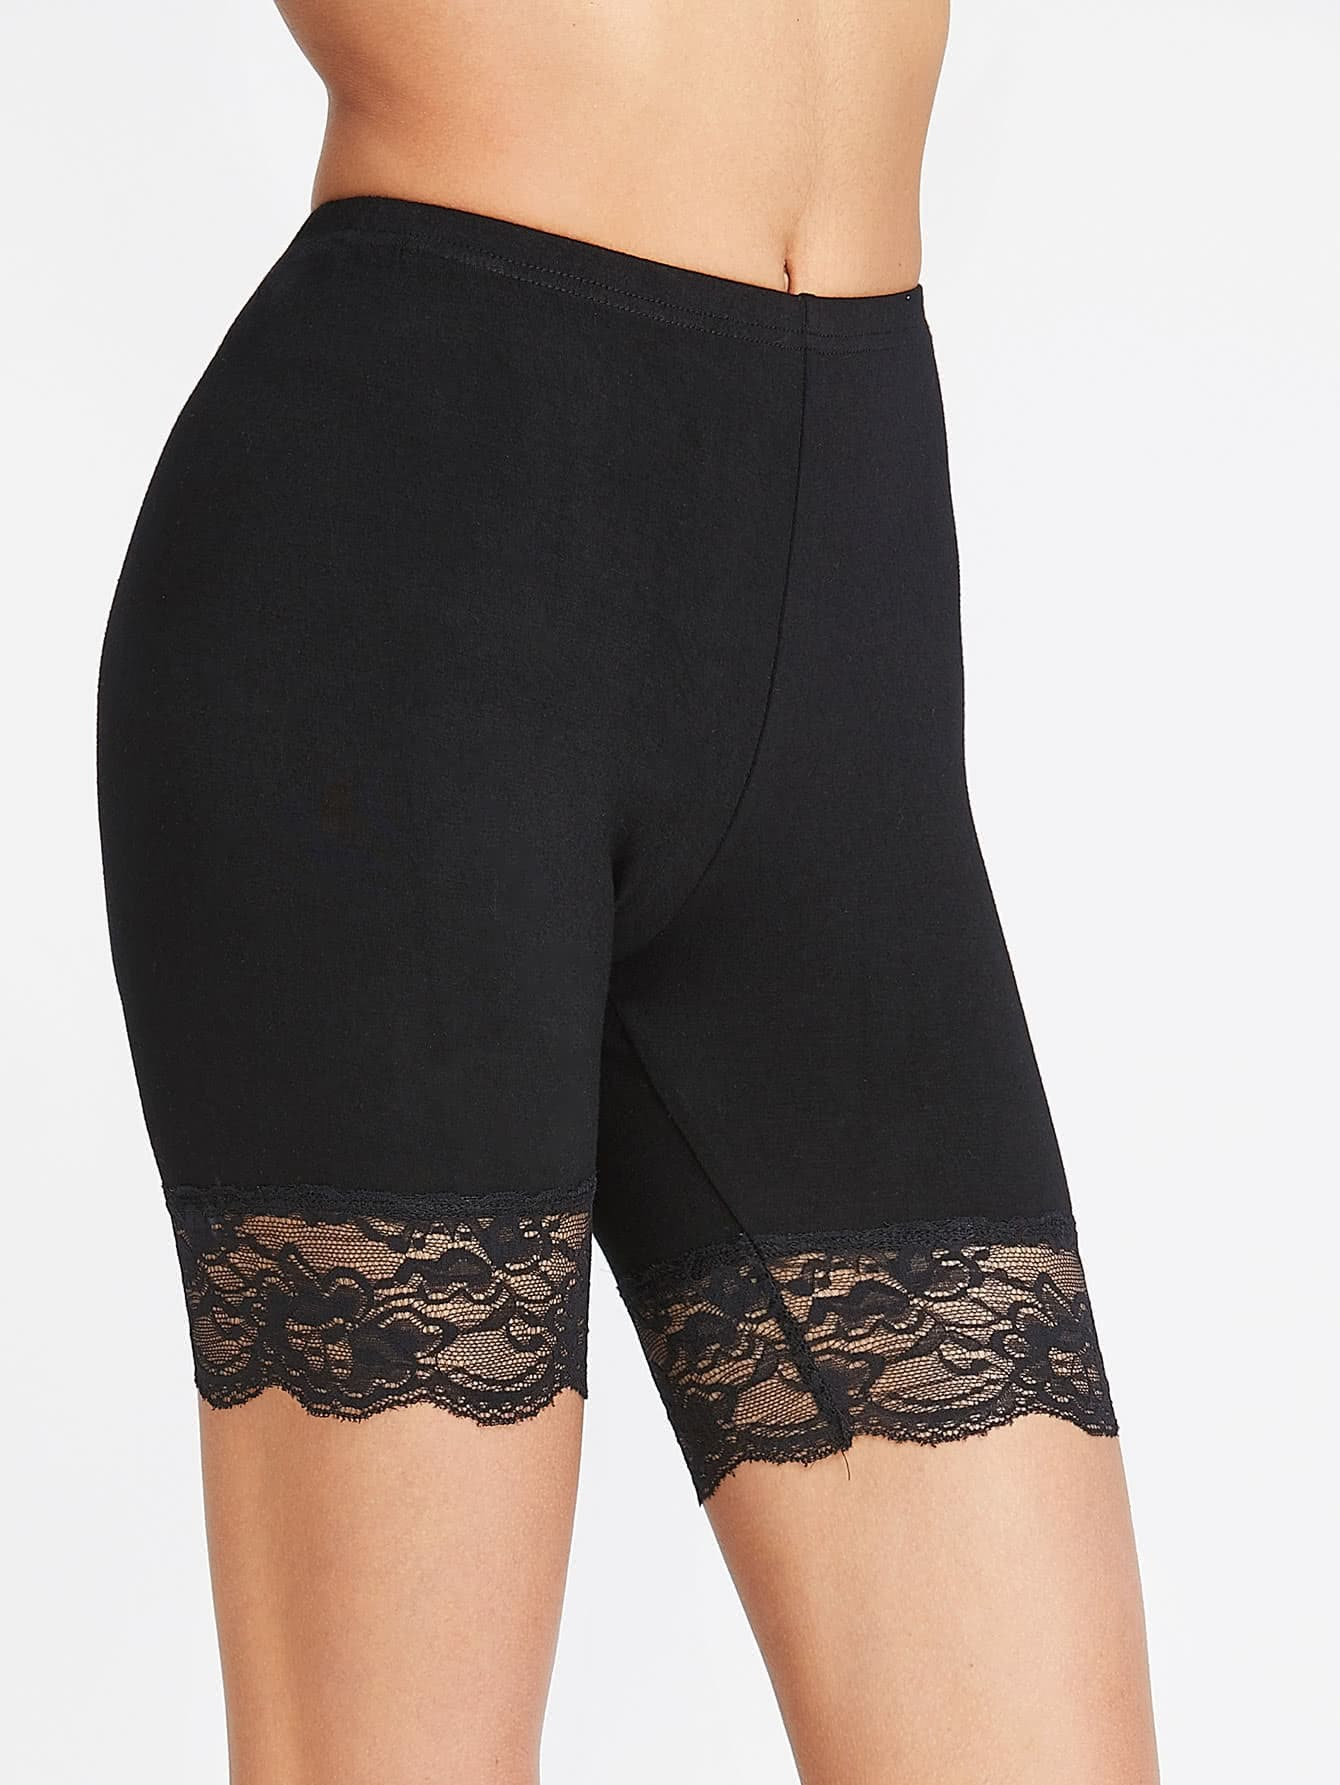 Black lace shorts fashion Fashion Nova is selling some very uncomfortable